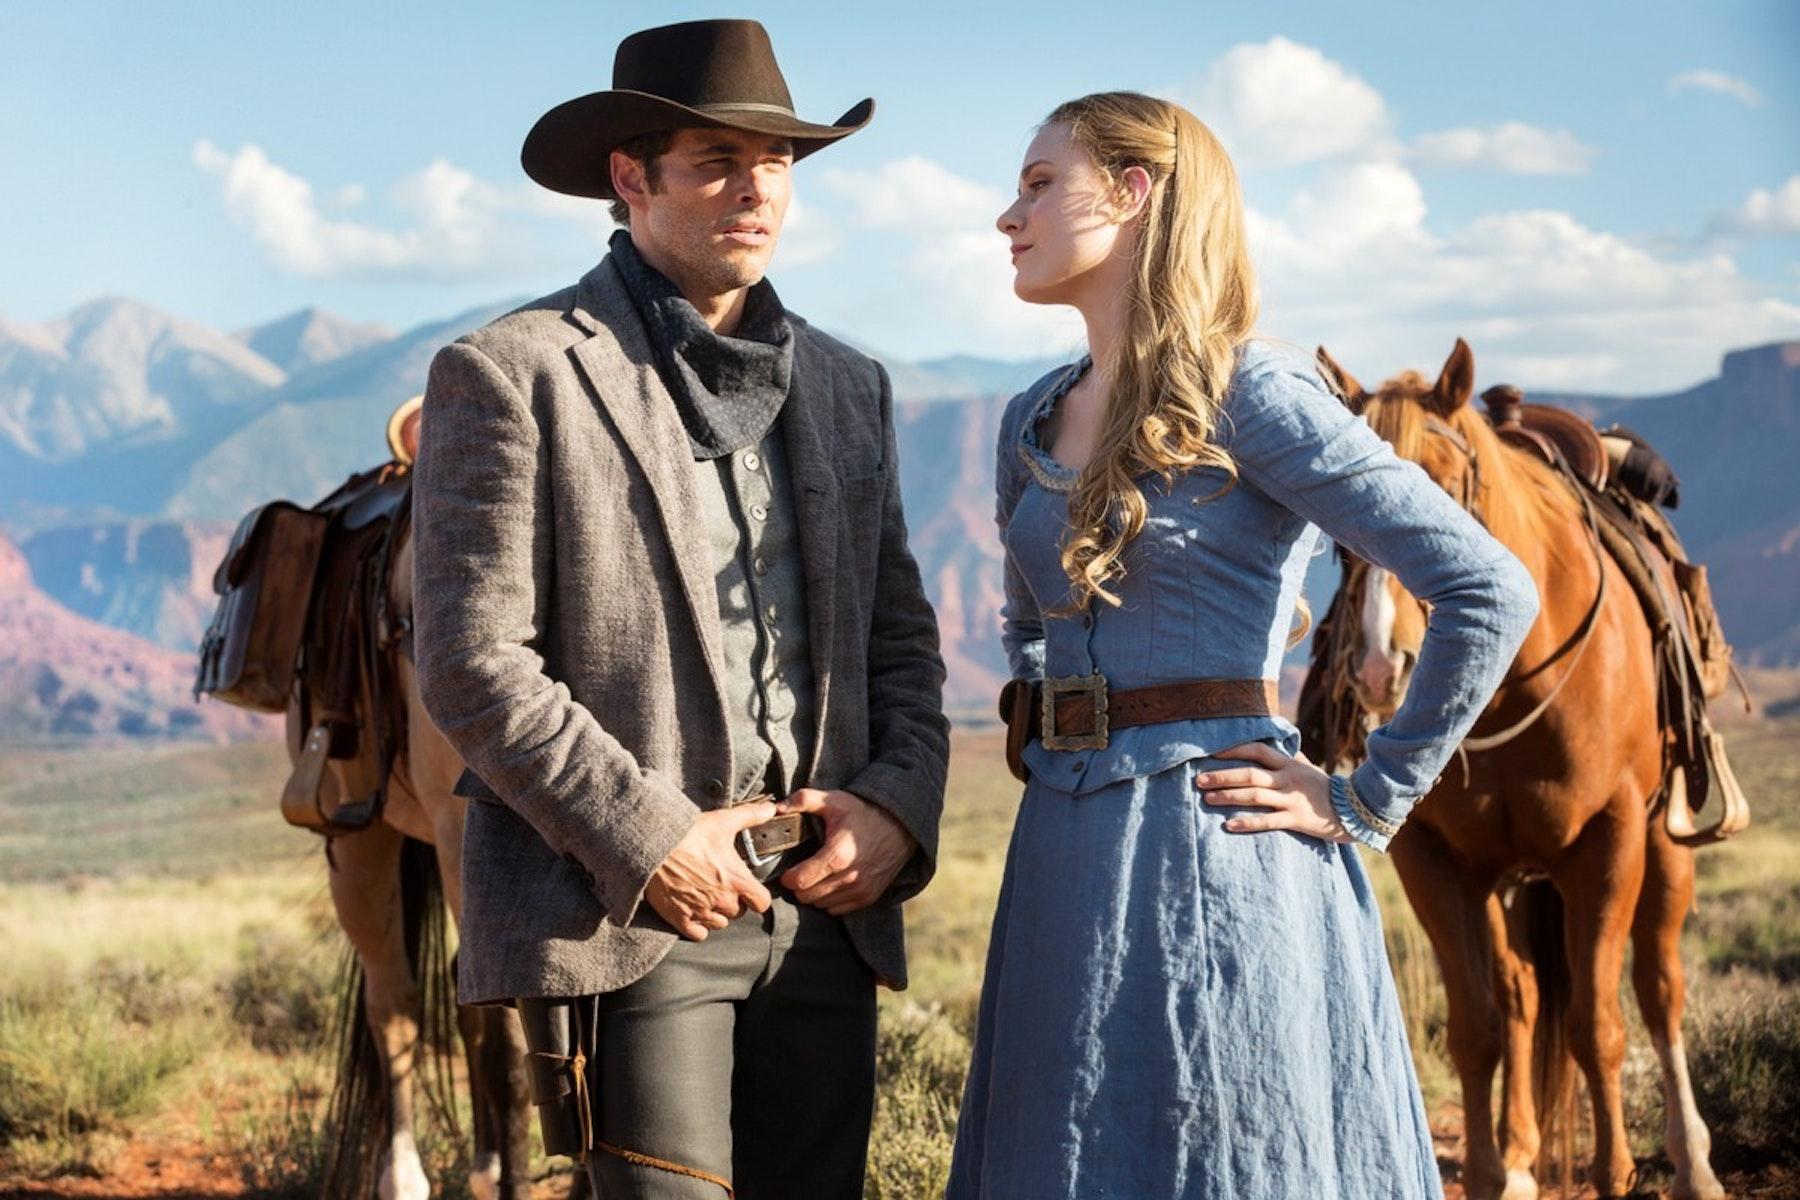 James Marsden as Teddy and Evan Rachel Wood as Dolores Abernathy.